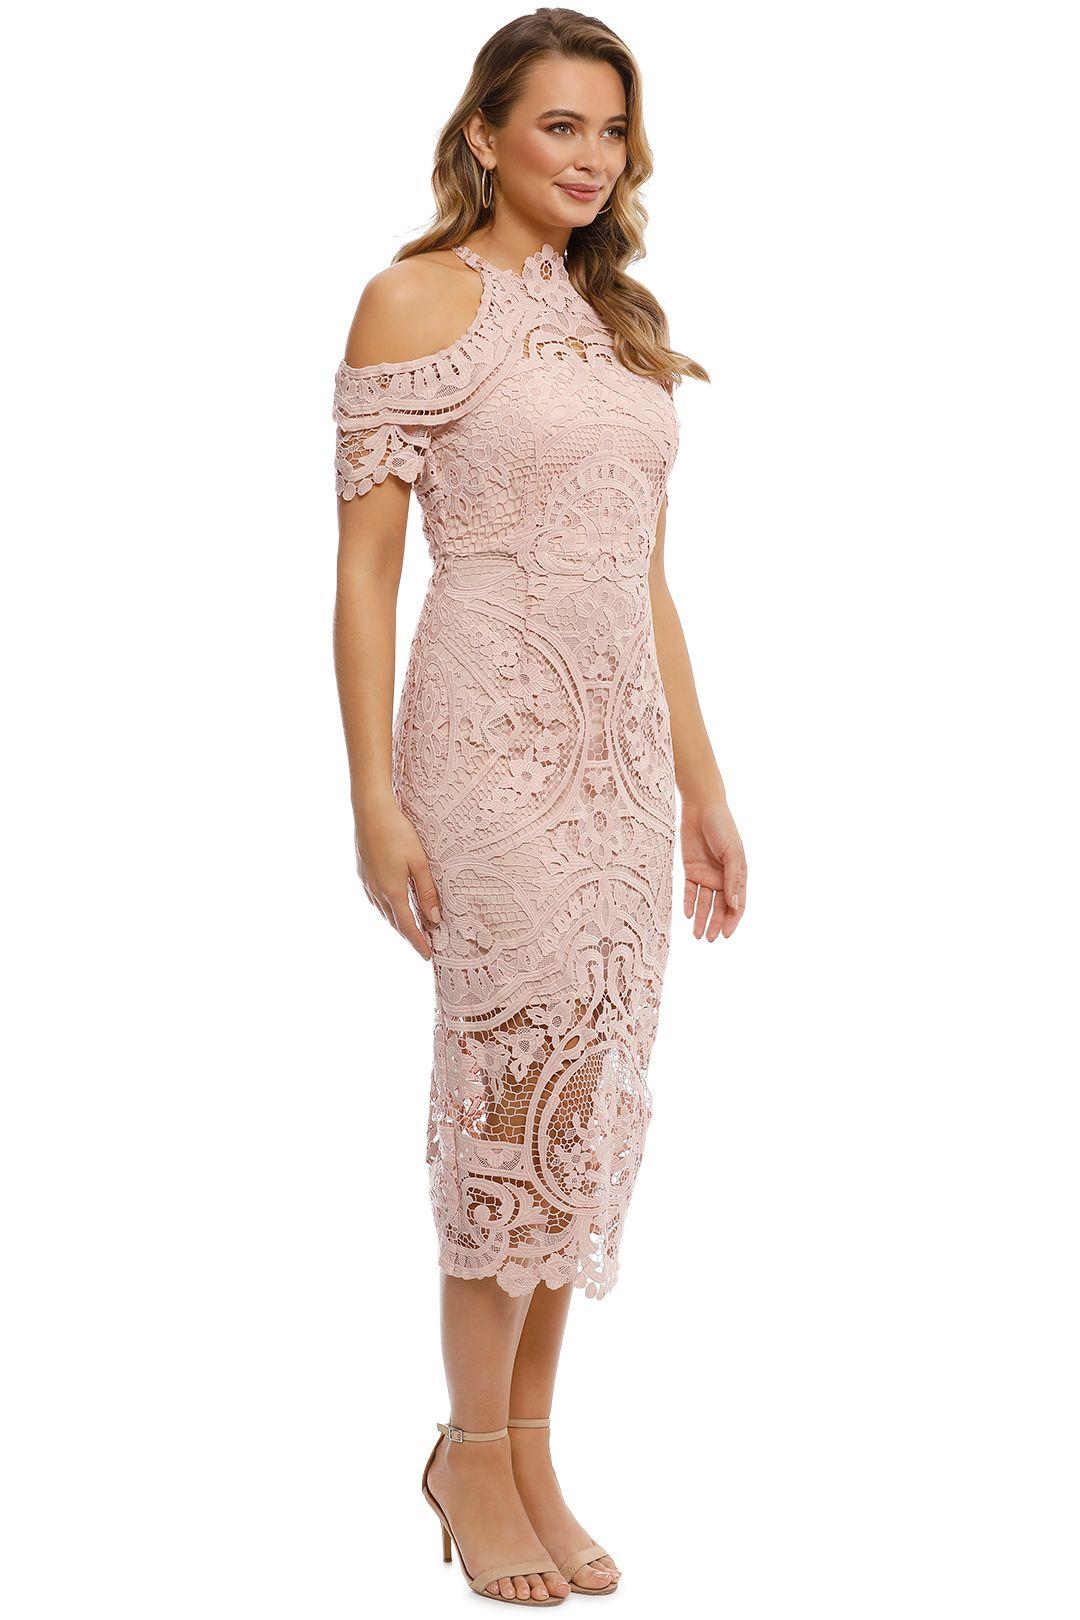 Thurley - Bouquet Dress - Nude - Side